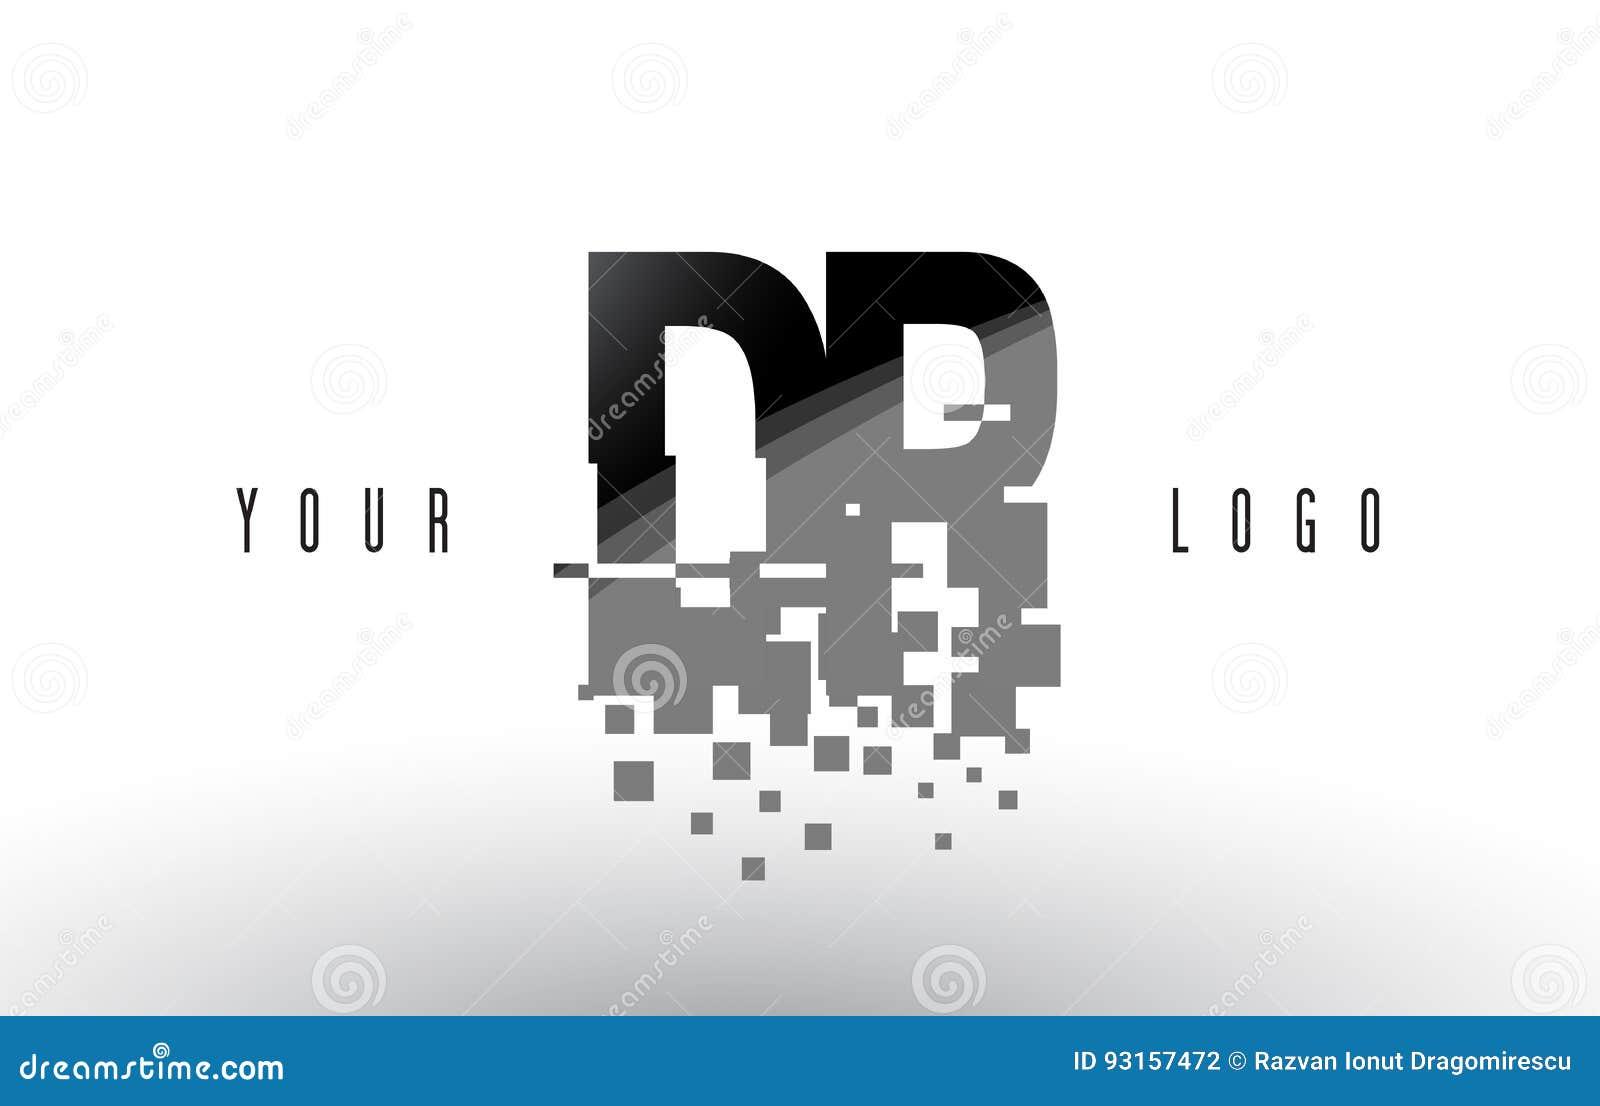 dr letters - Parfu kaptanband co